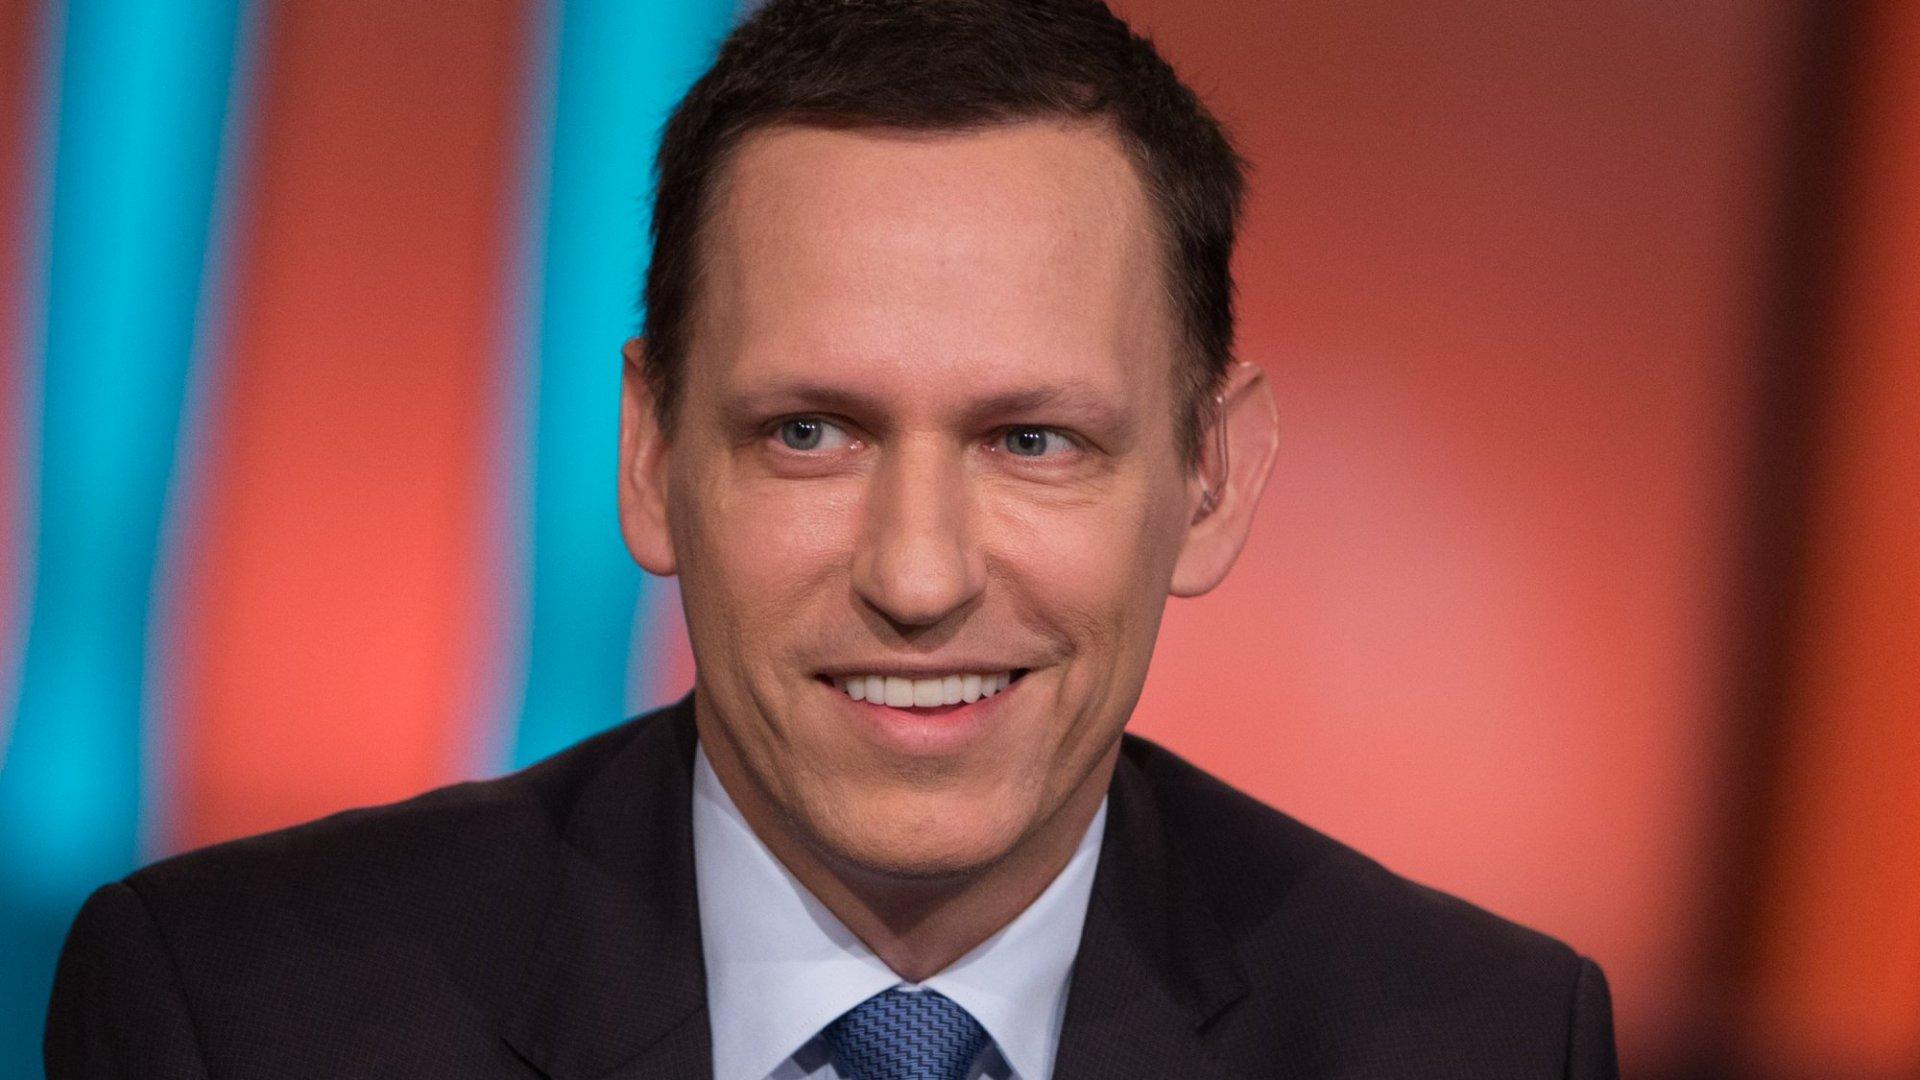 Peter Thiel Tells Graduates, 'Do Not Squander Your Ignorance'